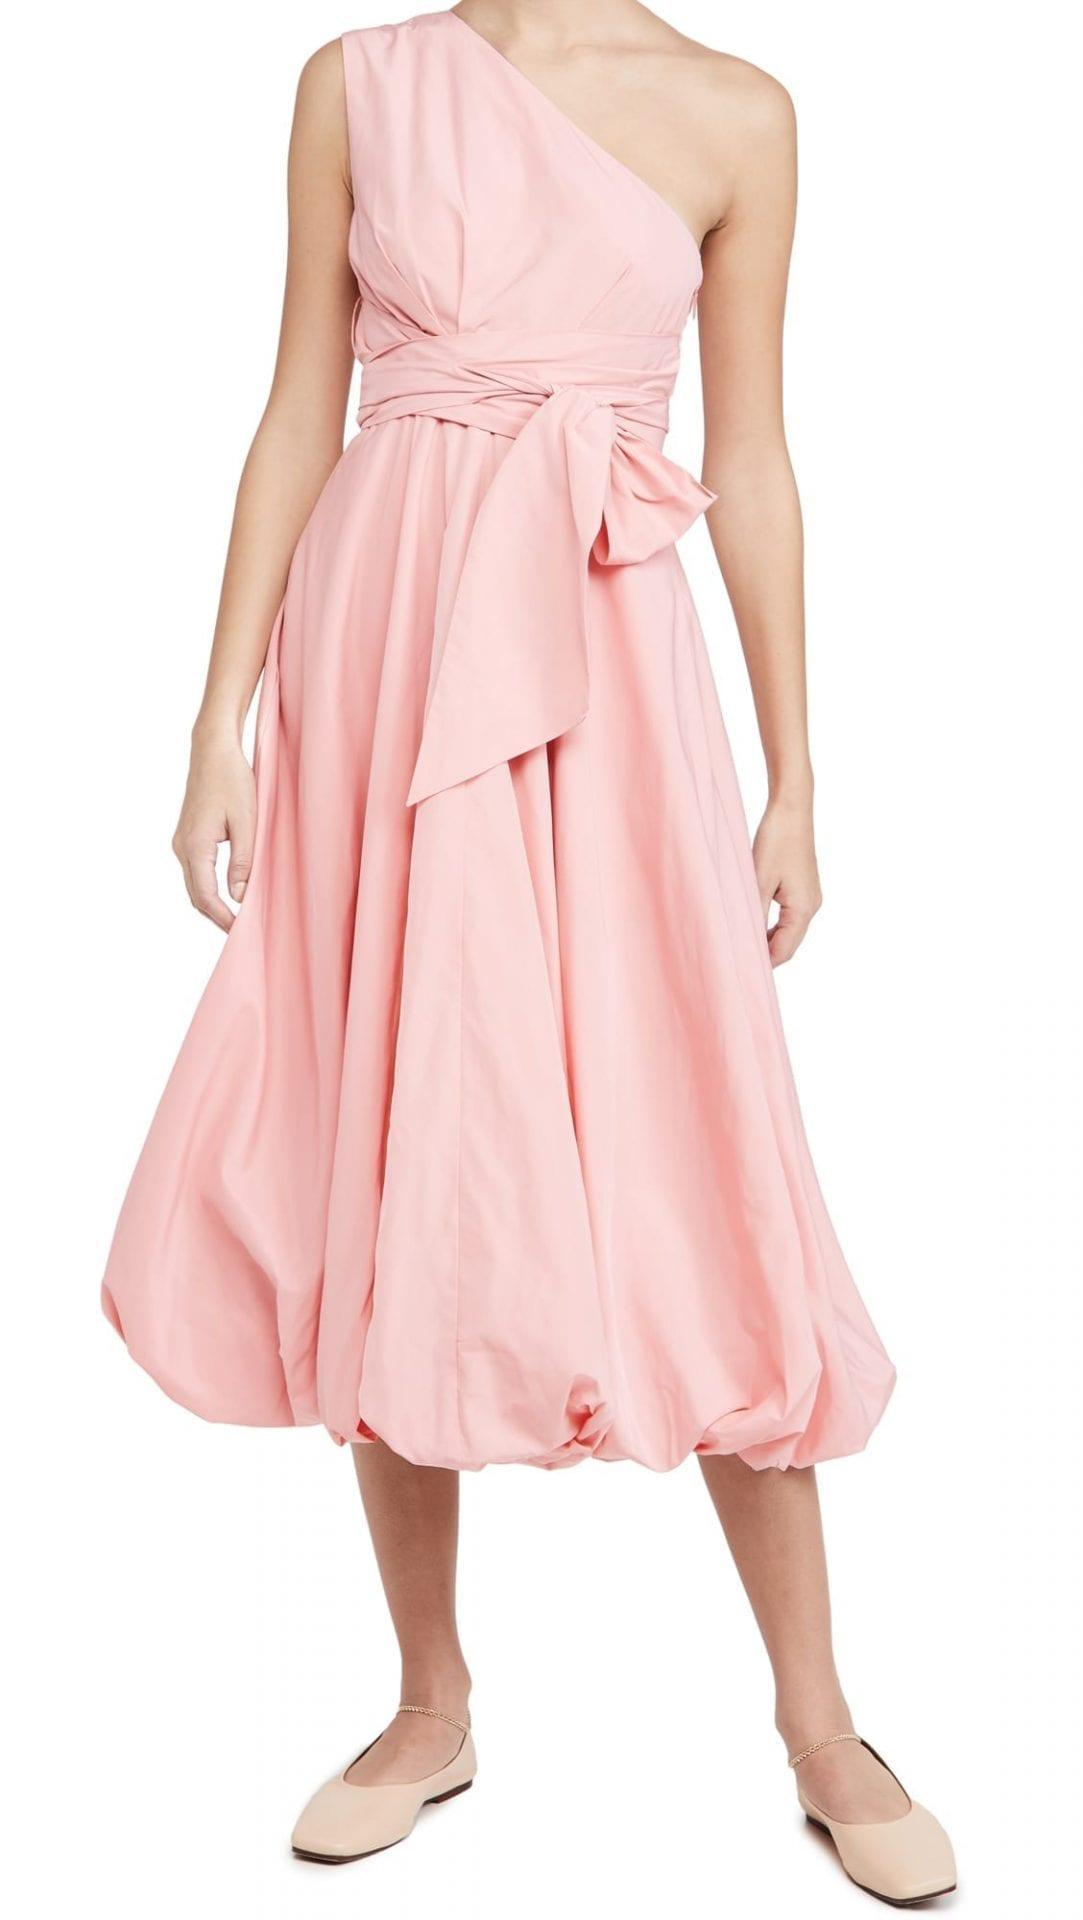 TIBI Taffeta One Shoulder Dress